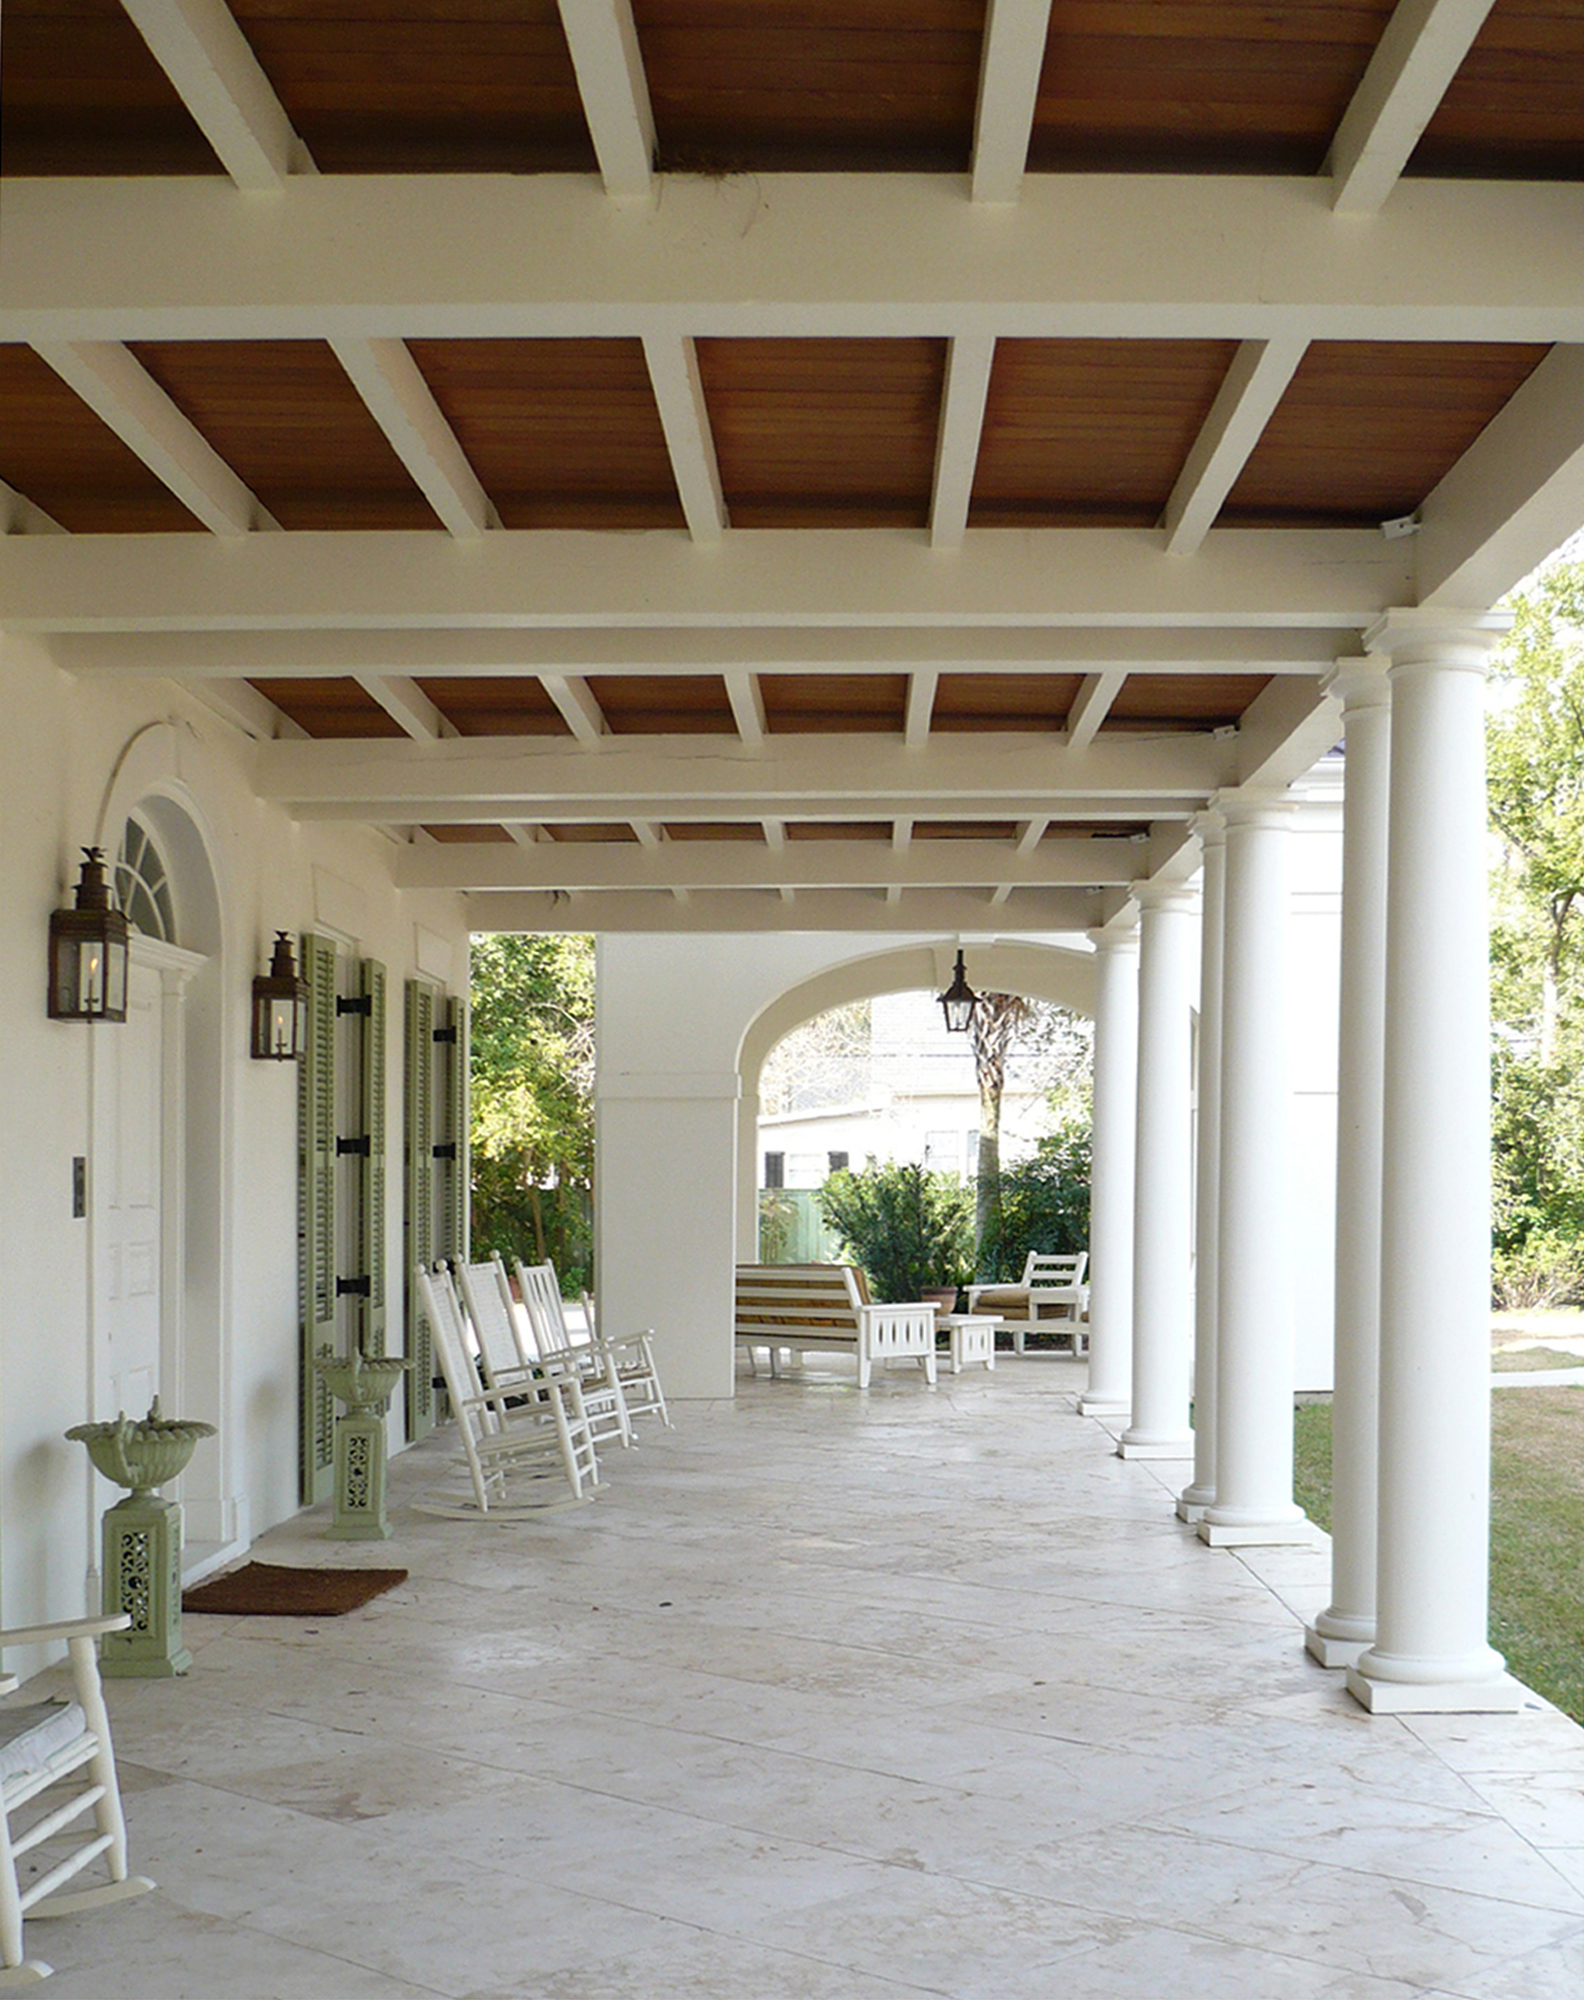 Pritchard_Macedonia front porch_1584x2000_P1030991.jpg